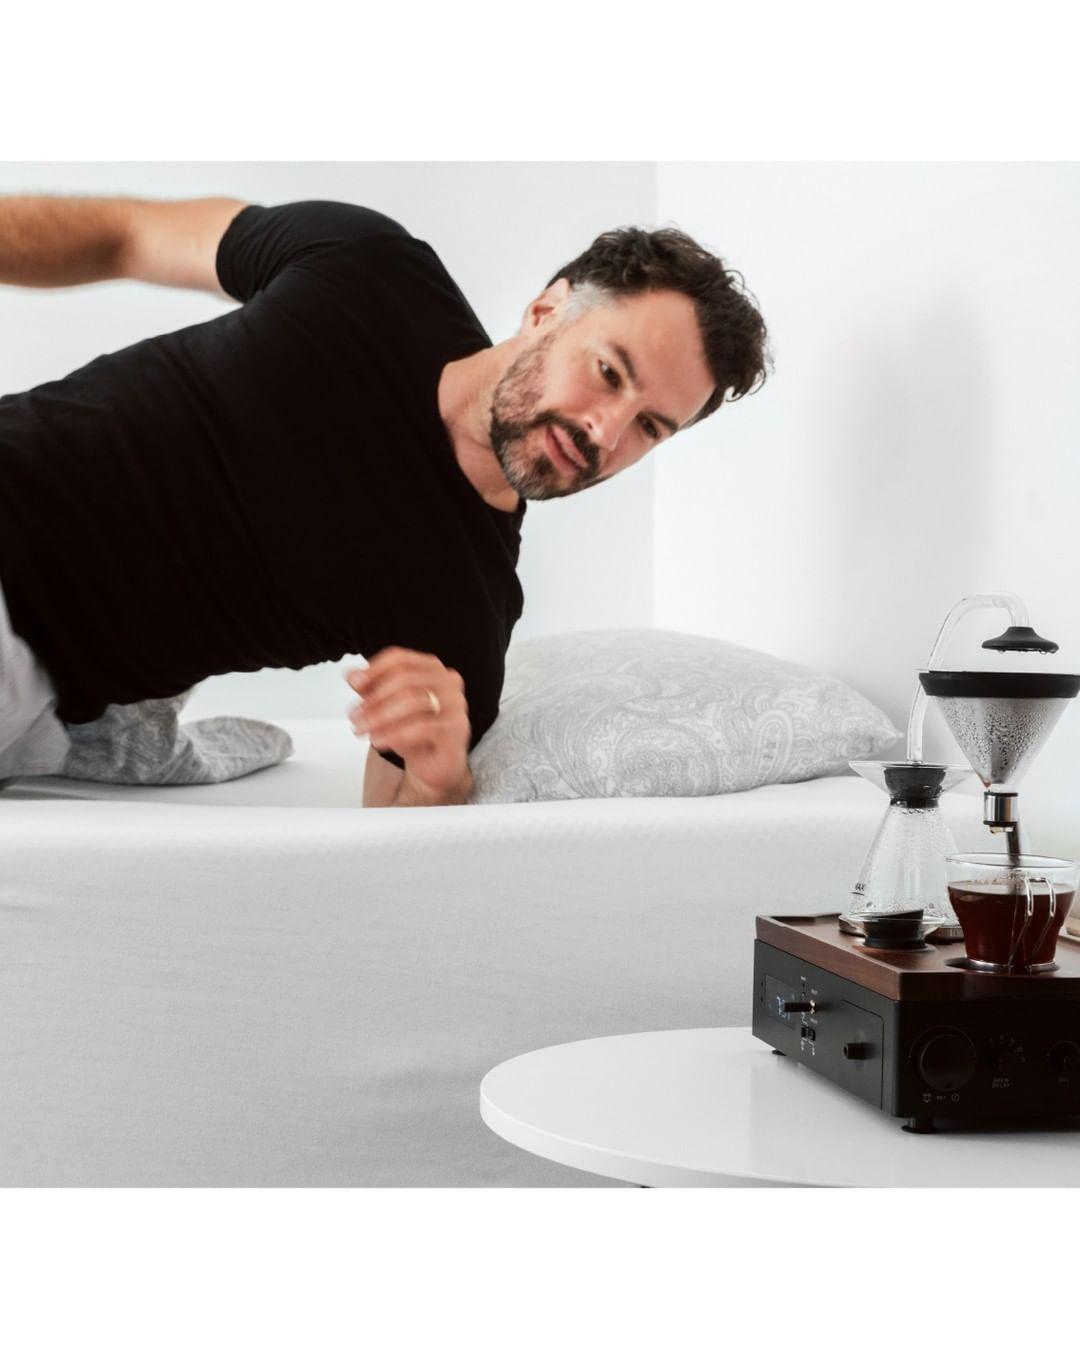 QUIRKY GADGETS: The Barisieur alarm clock<br />